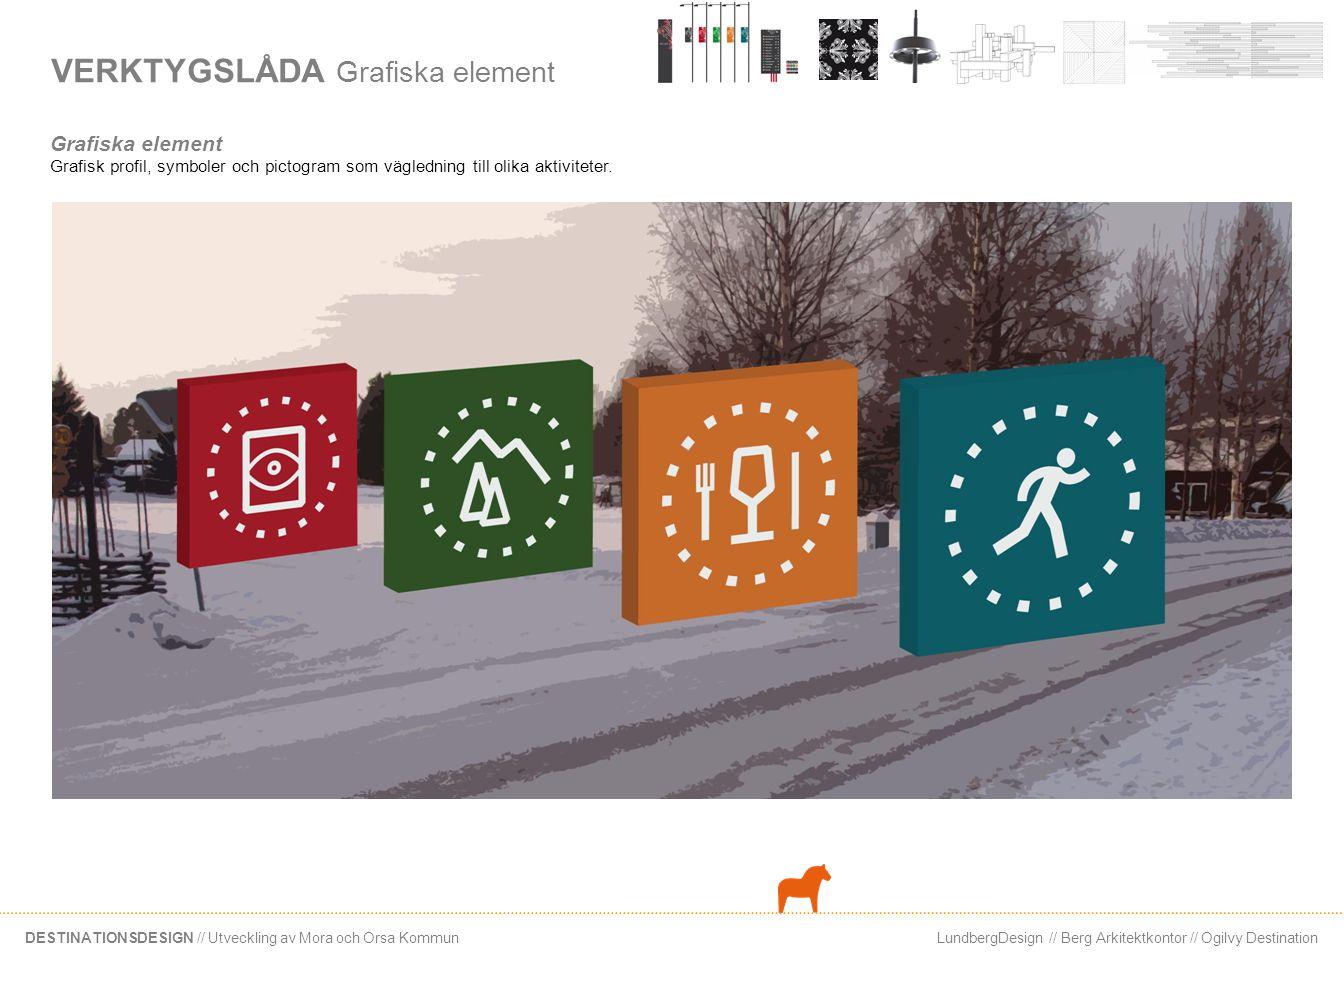 LundbergDesign // Berg Arkitektkontor // Ogilvy DestinationDESTINATIONSDESIGN // Utveckling av Mora och Orsa Kommun VERKTYGSLÅDA Grafiska element Graf